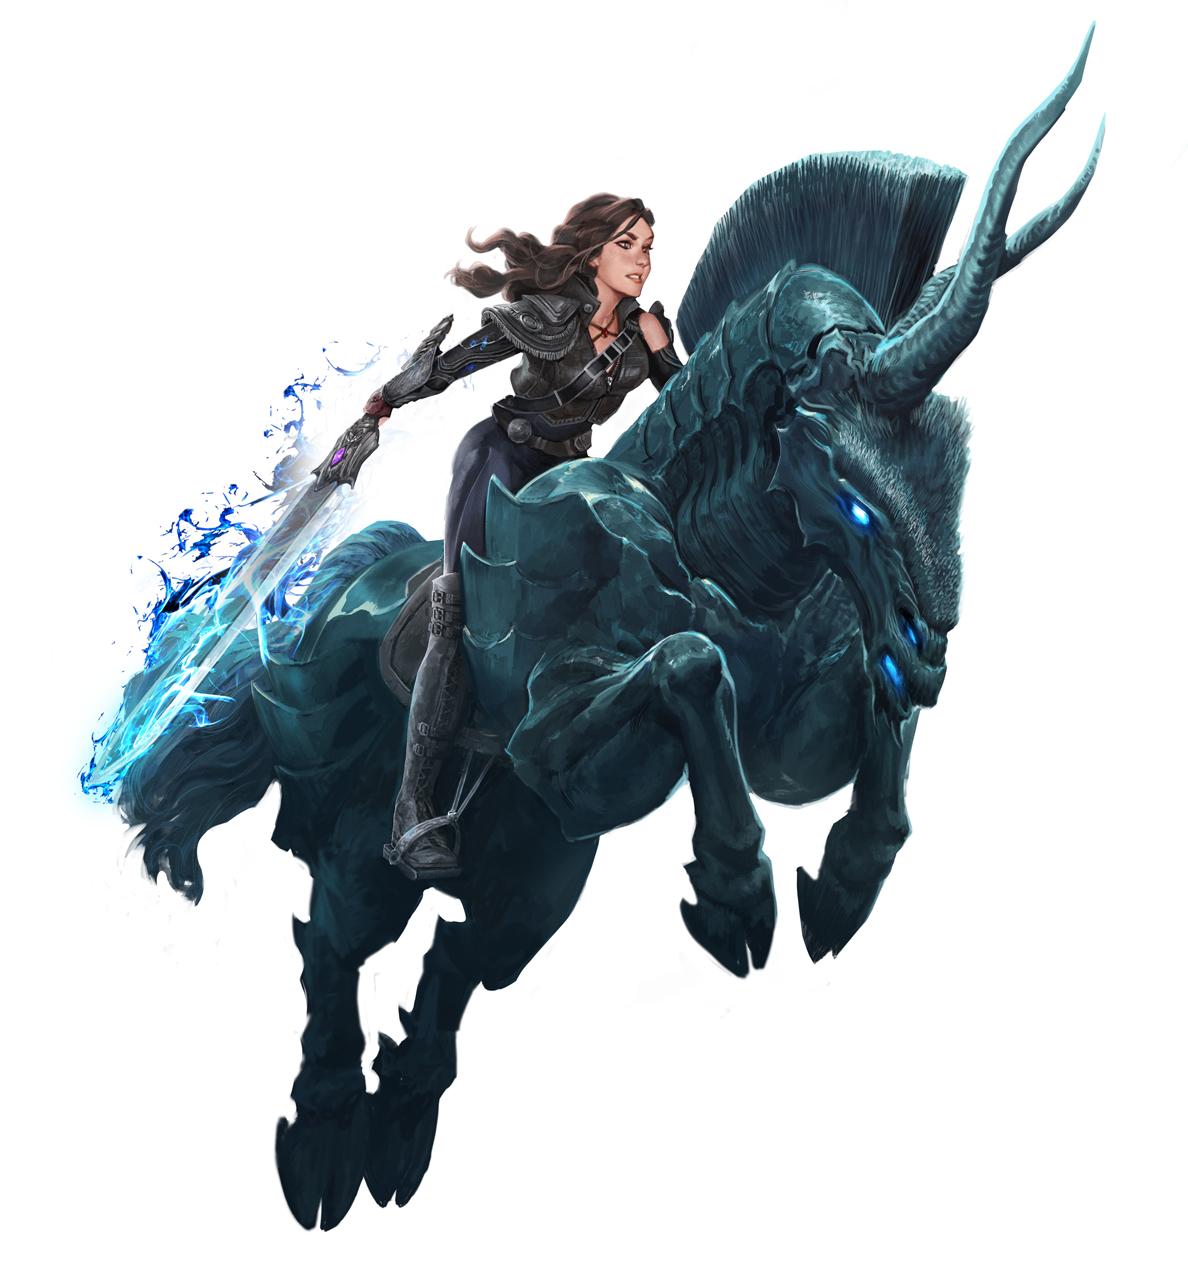 Ryan_alexander_lee_Spiracorn_Cavalry_FFXE.jpg